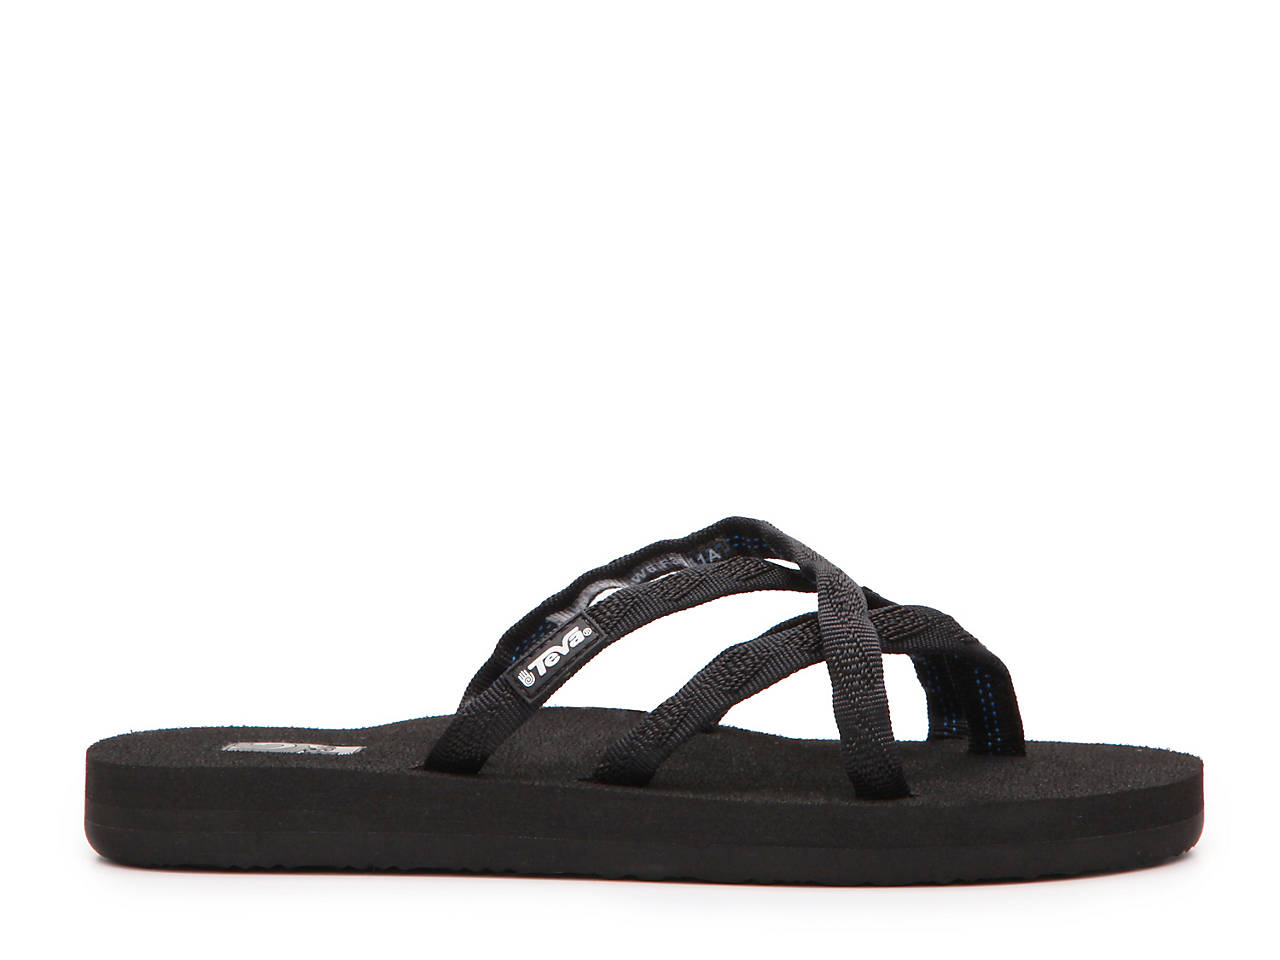 ca20b59bb Teva Olowahu Flip Flop Women s Shoes